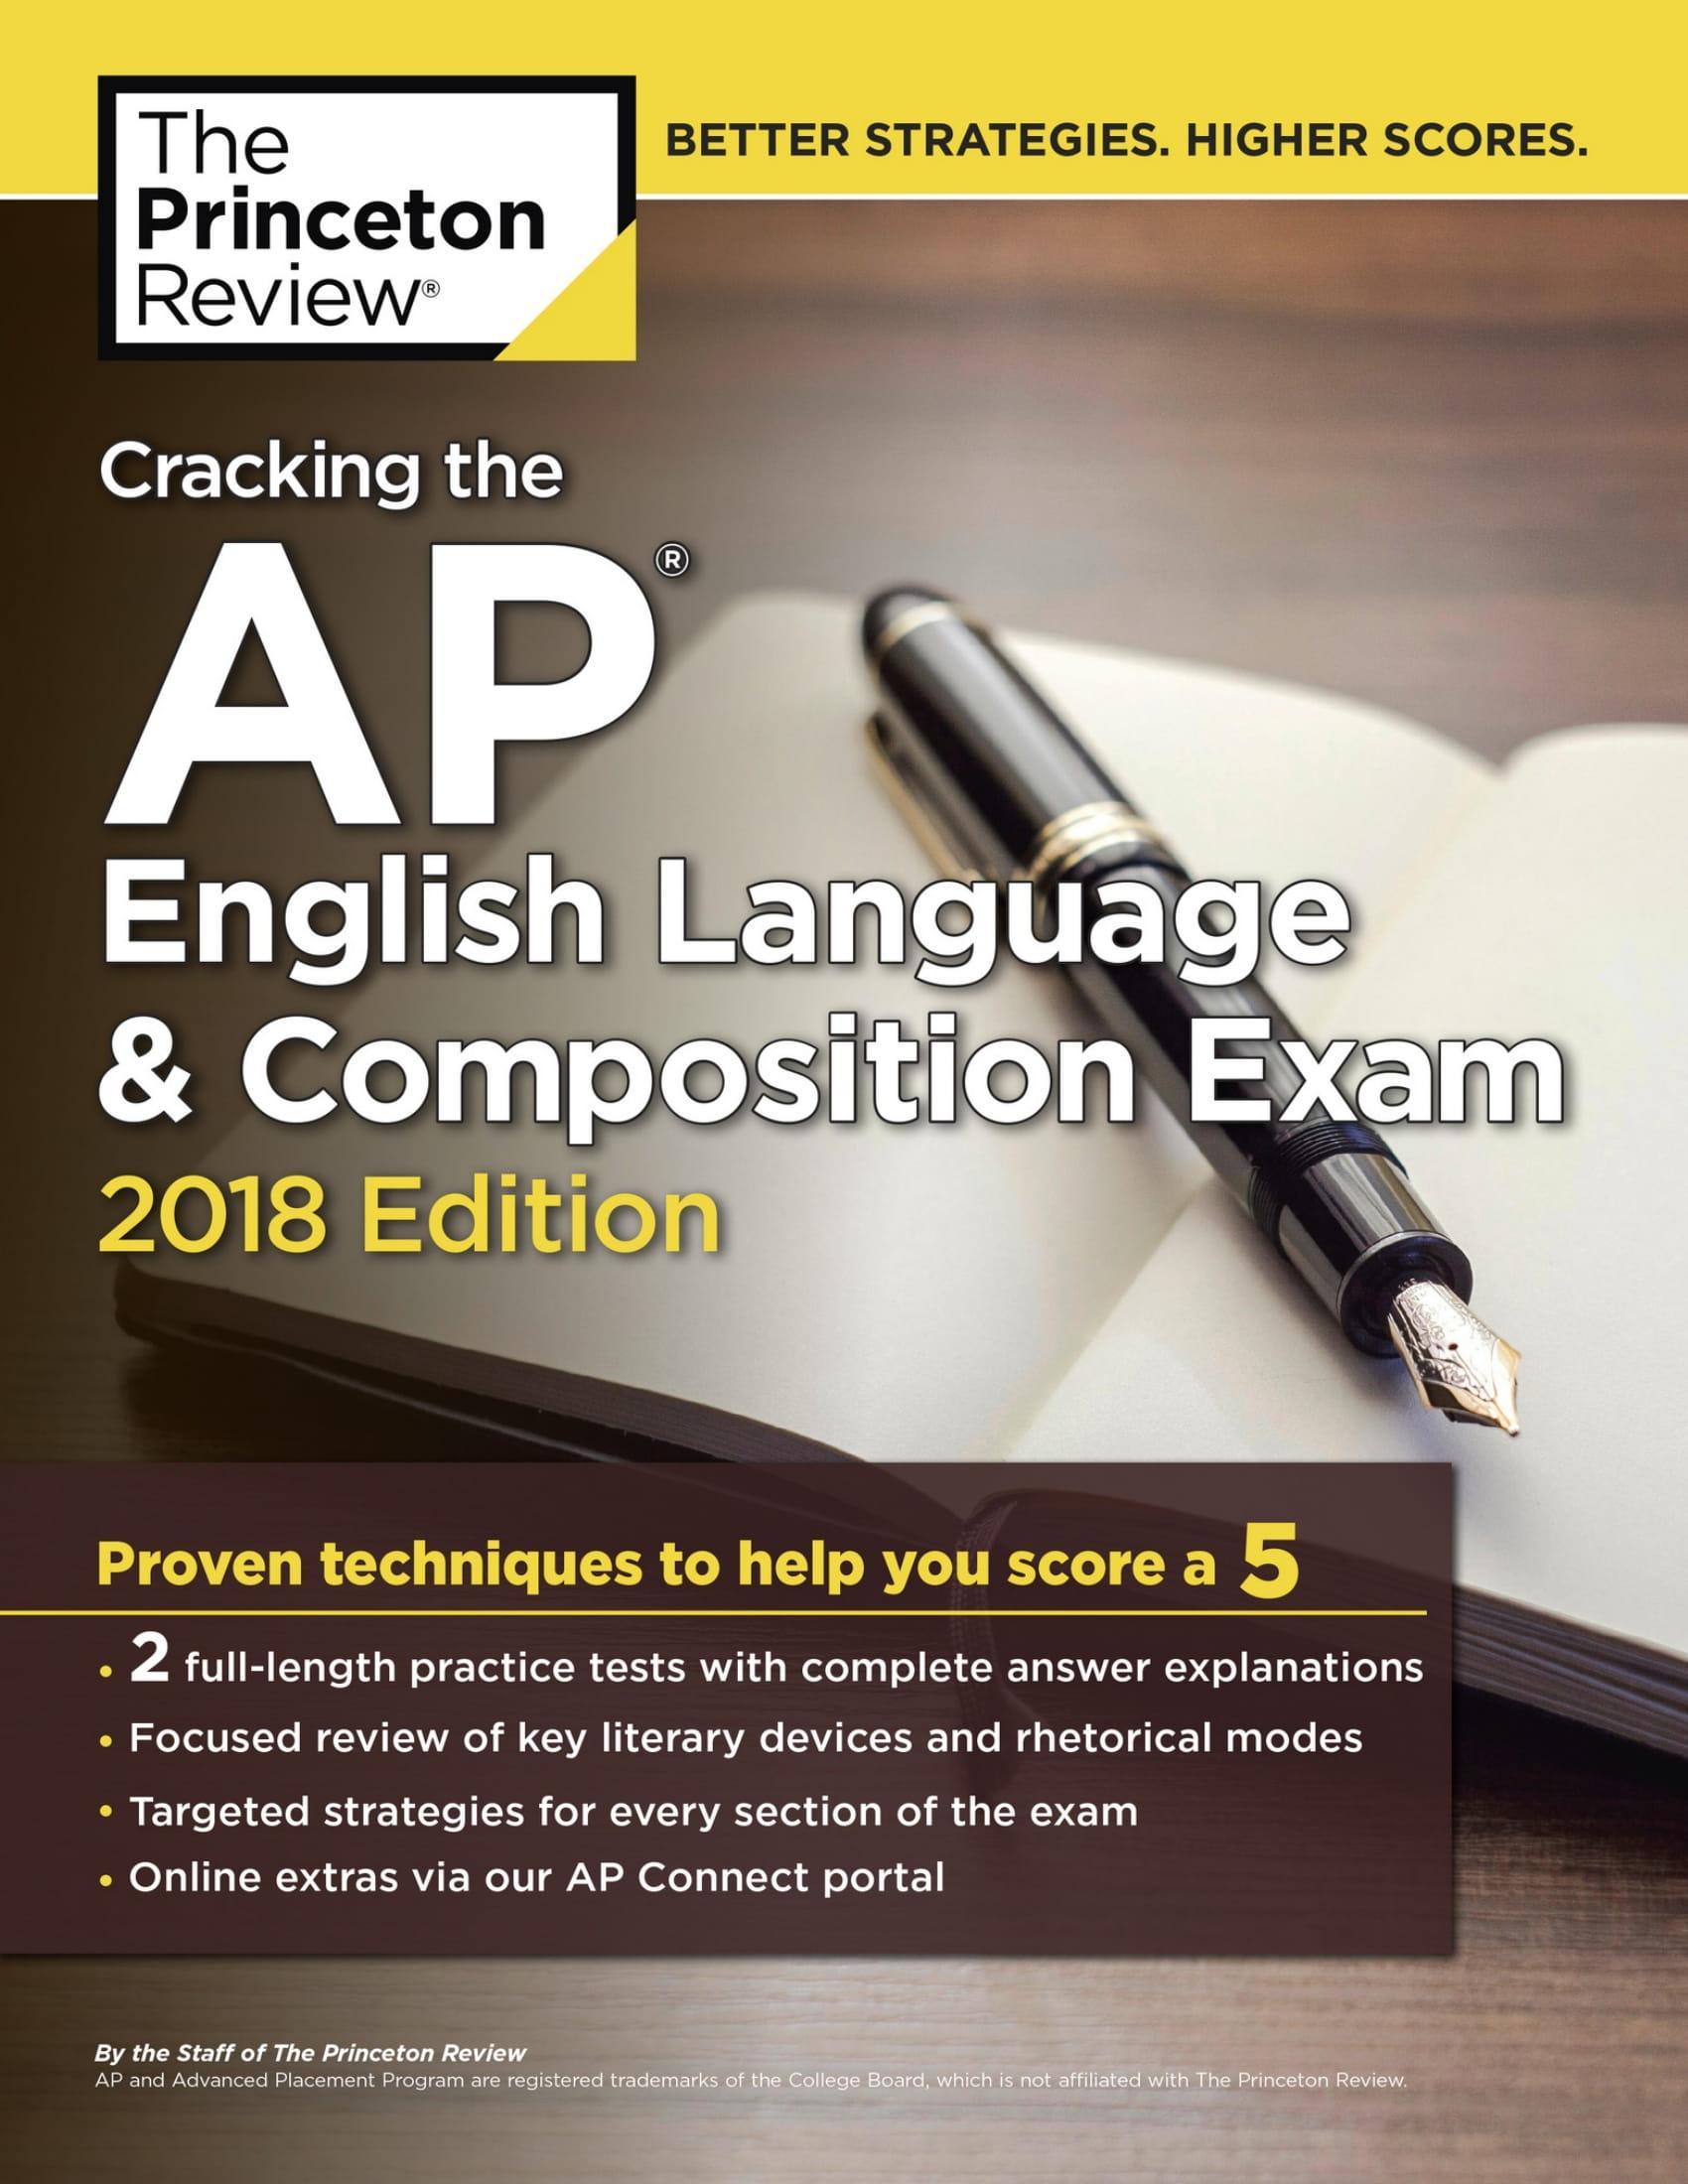 Mua Cracking the AP English Language & Composition Exam, 2018 Edition